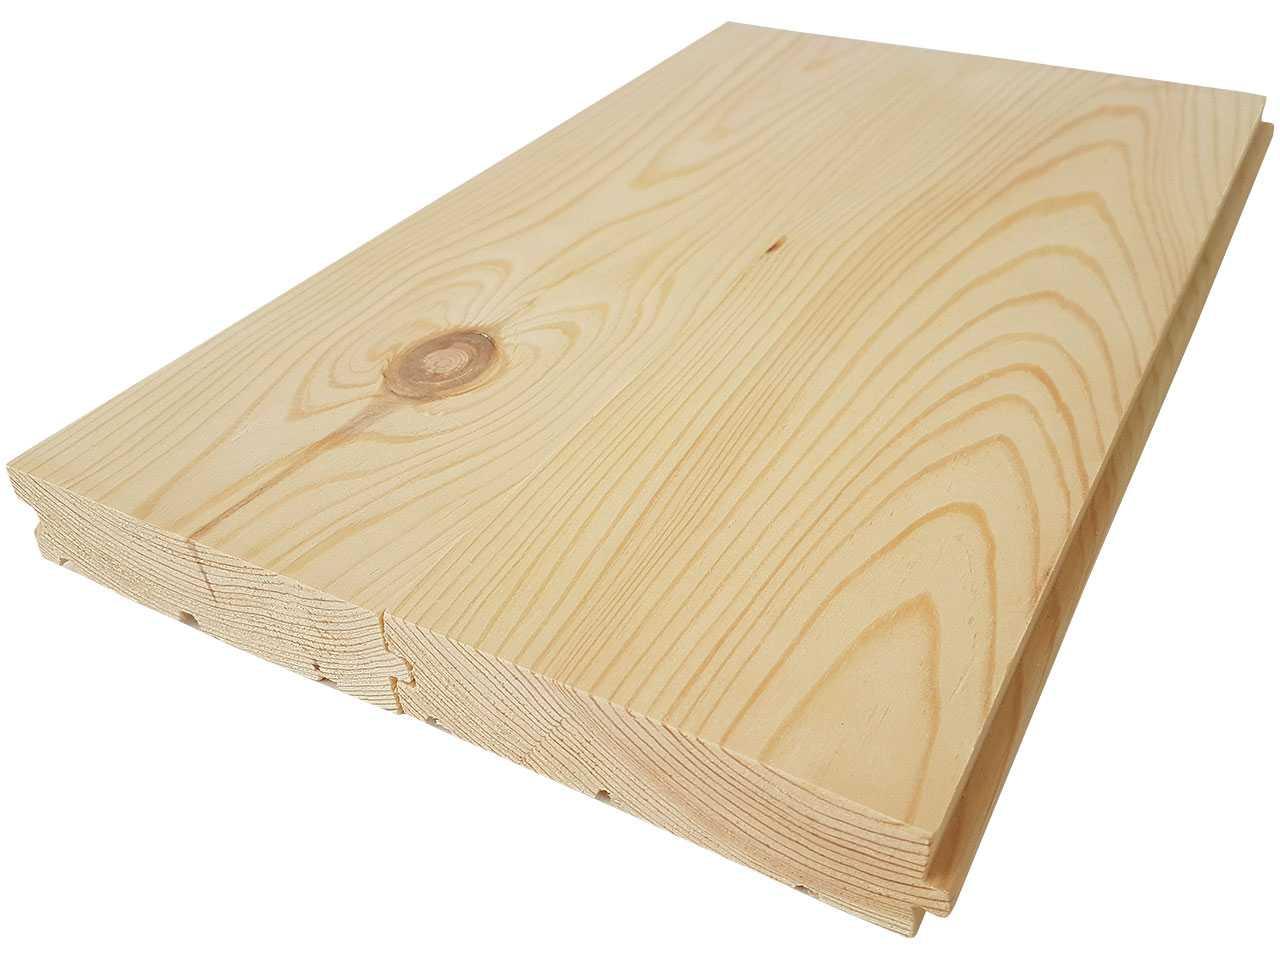 Доска пола цельная сосна, размер: 125/130x35x4500 мм.